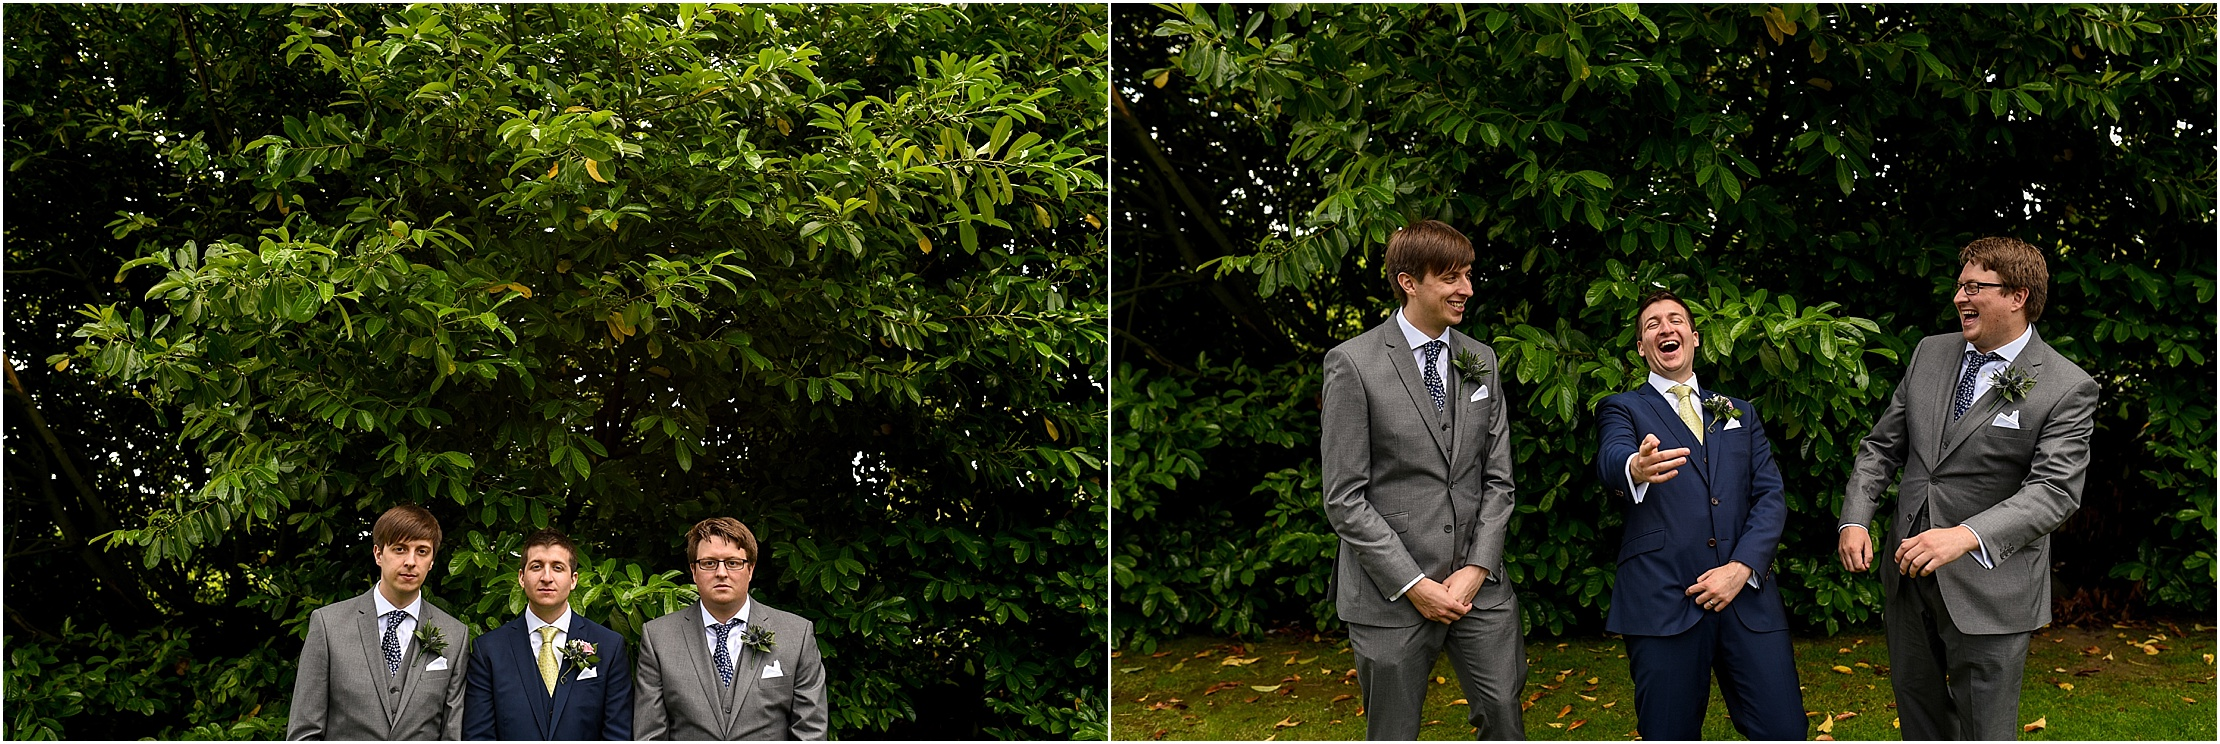 shireburn-arms-wedding- 087.jpg